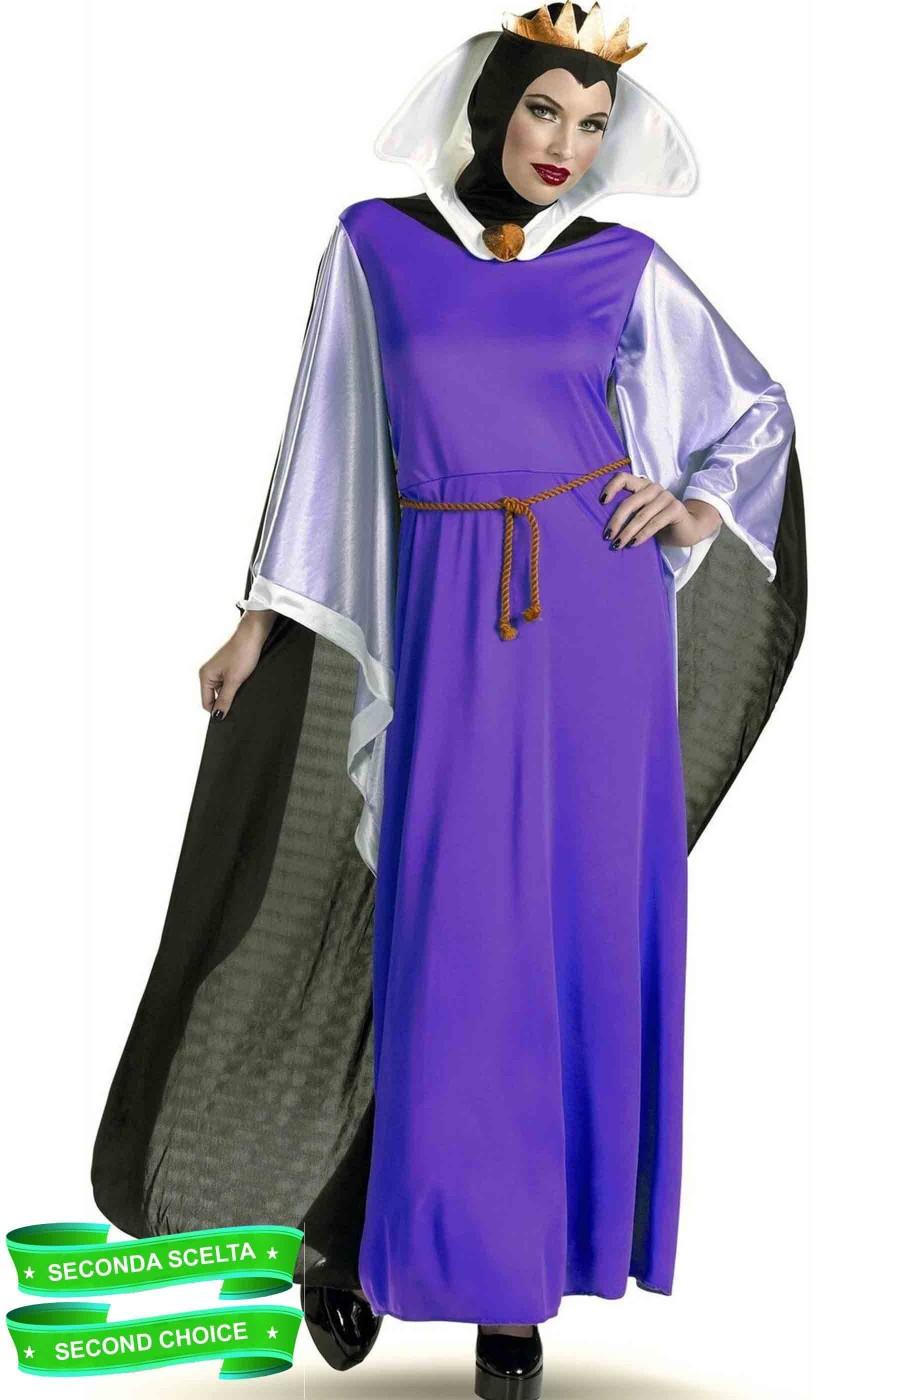 Costume di carnevale donna adulta Regina ravenna strega grimilde